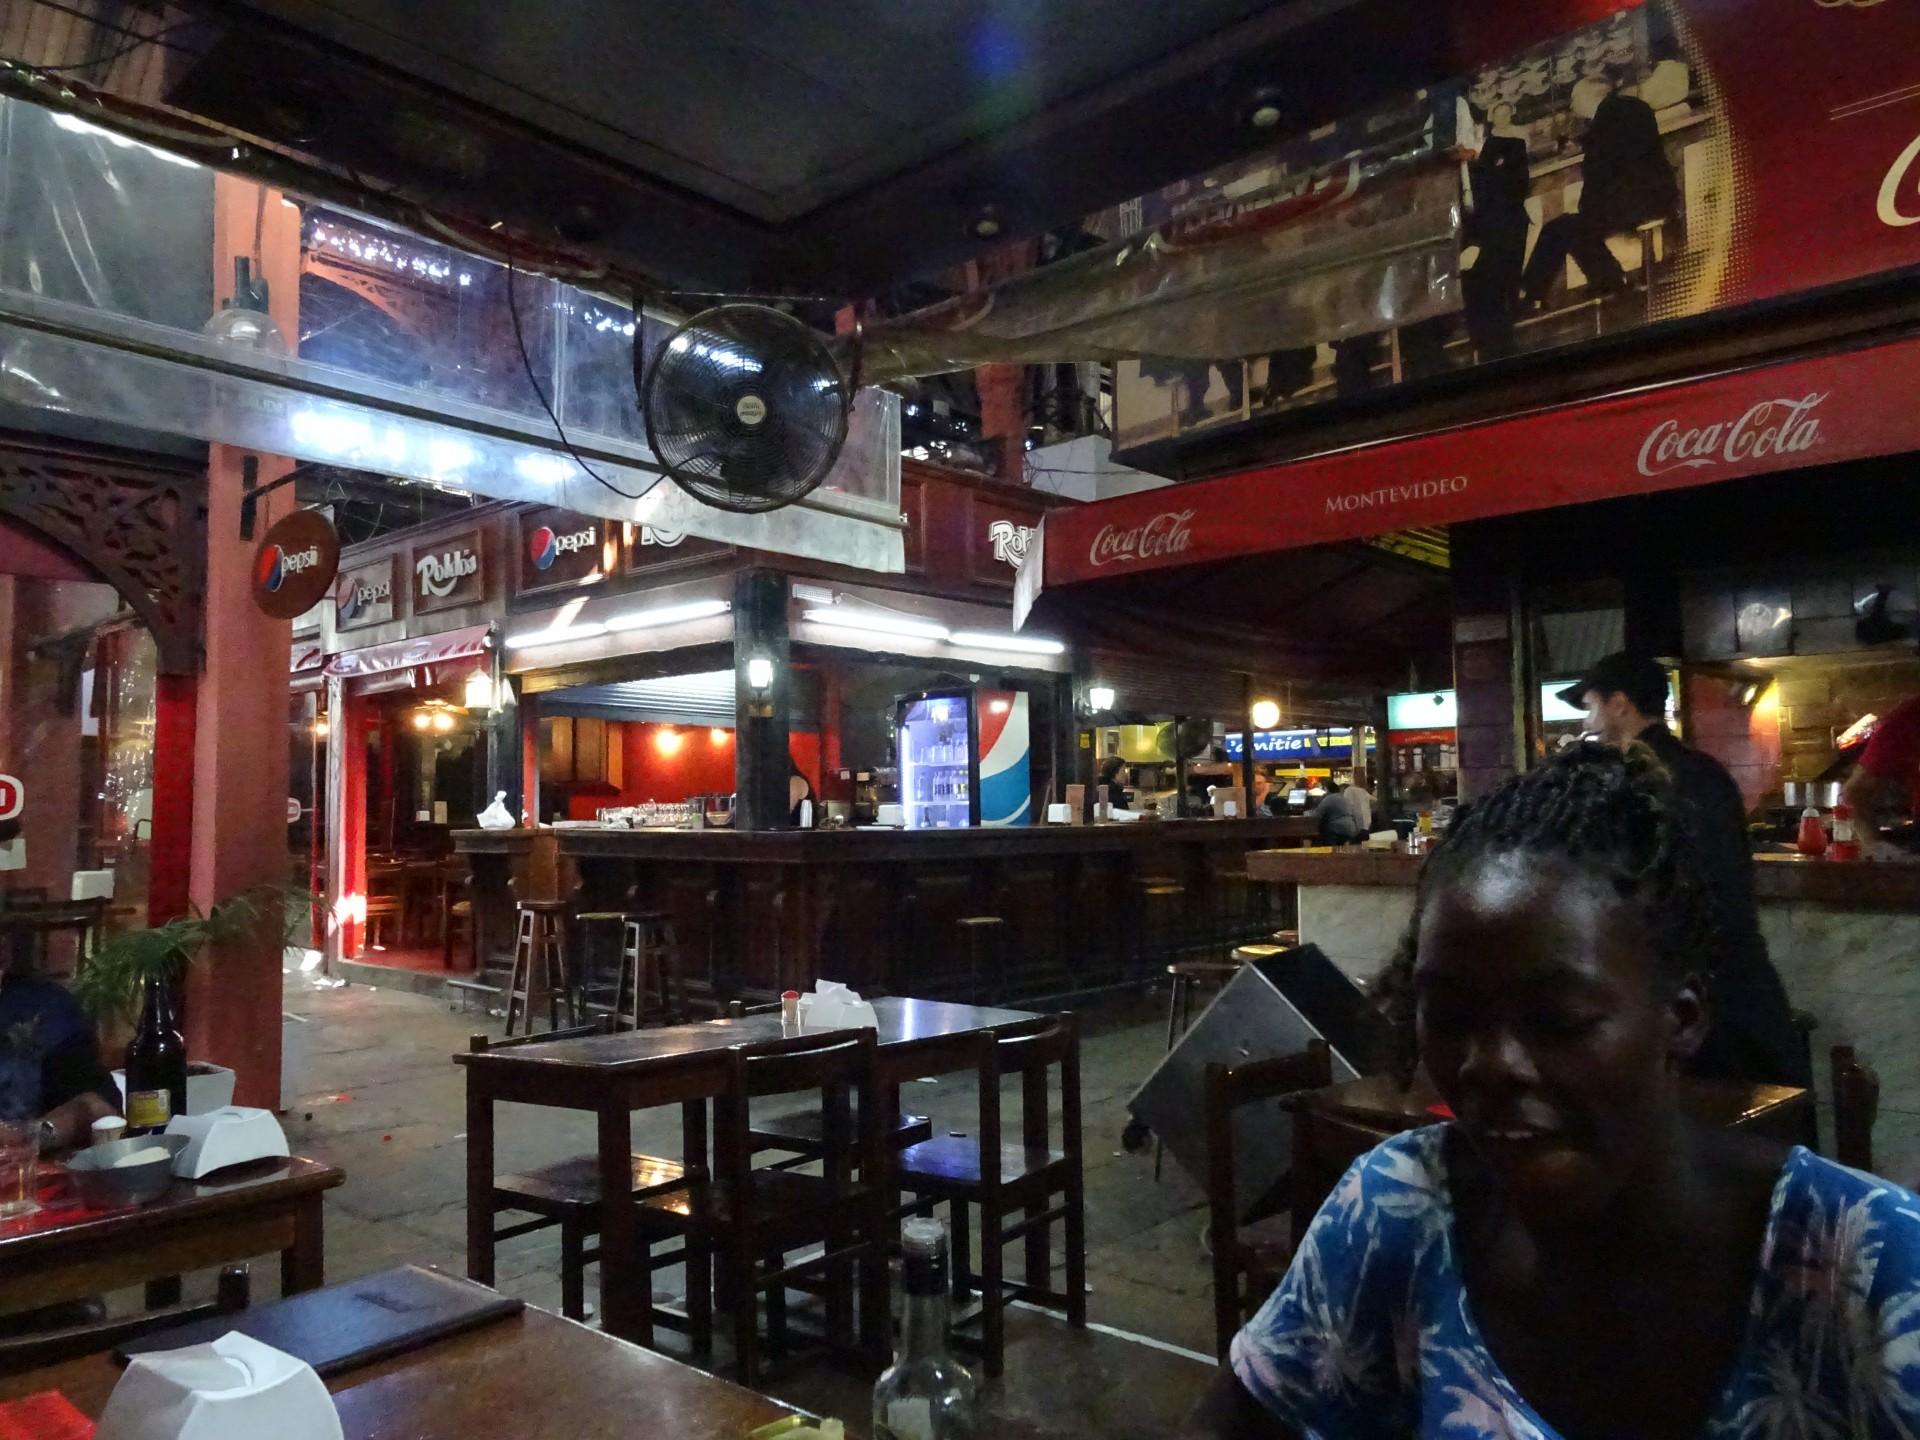 Asado in an empty market.